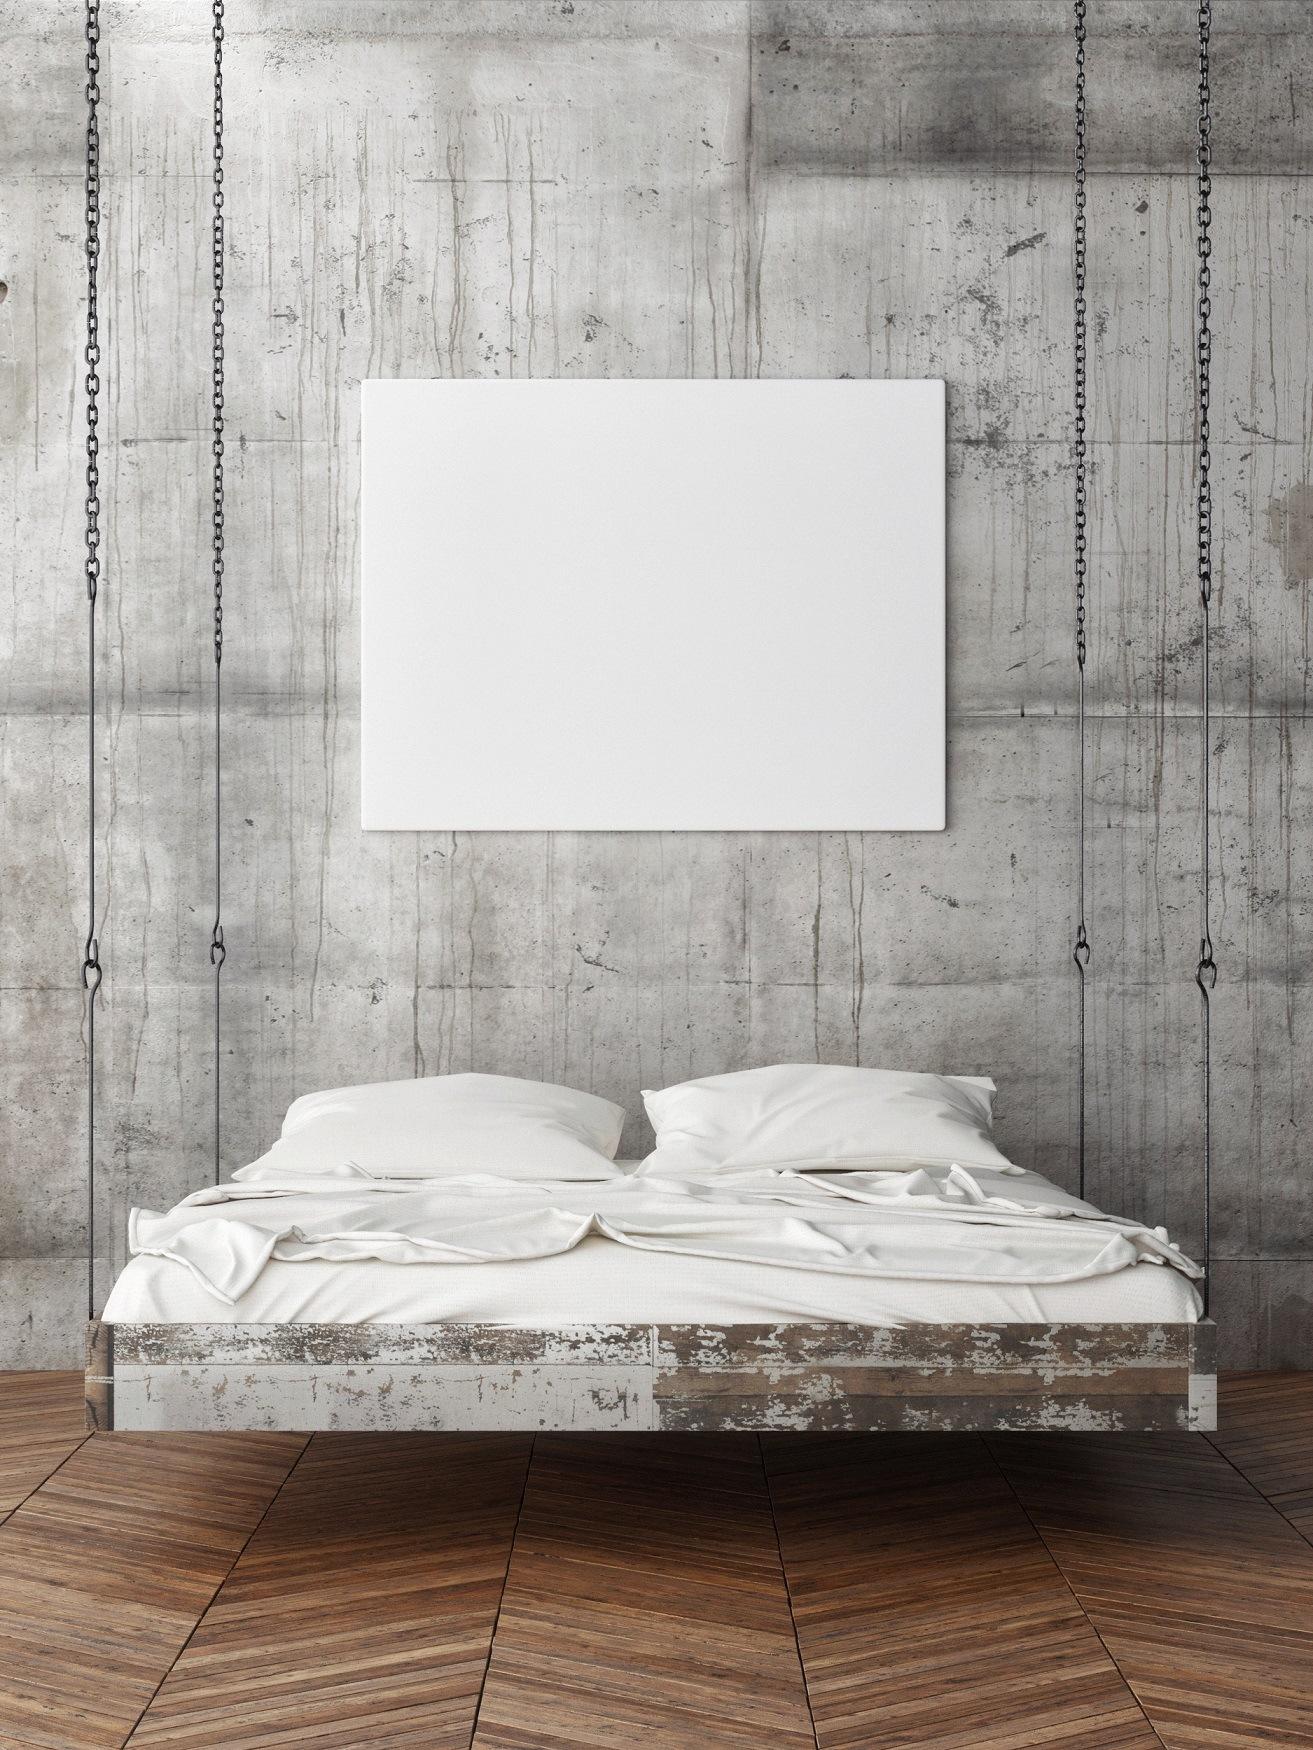 Concrete wall in modern bedroom